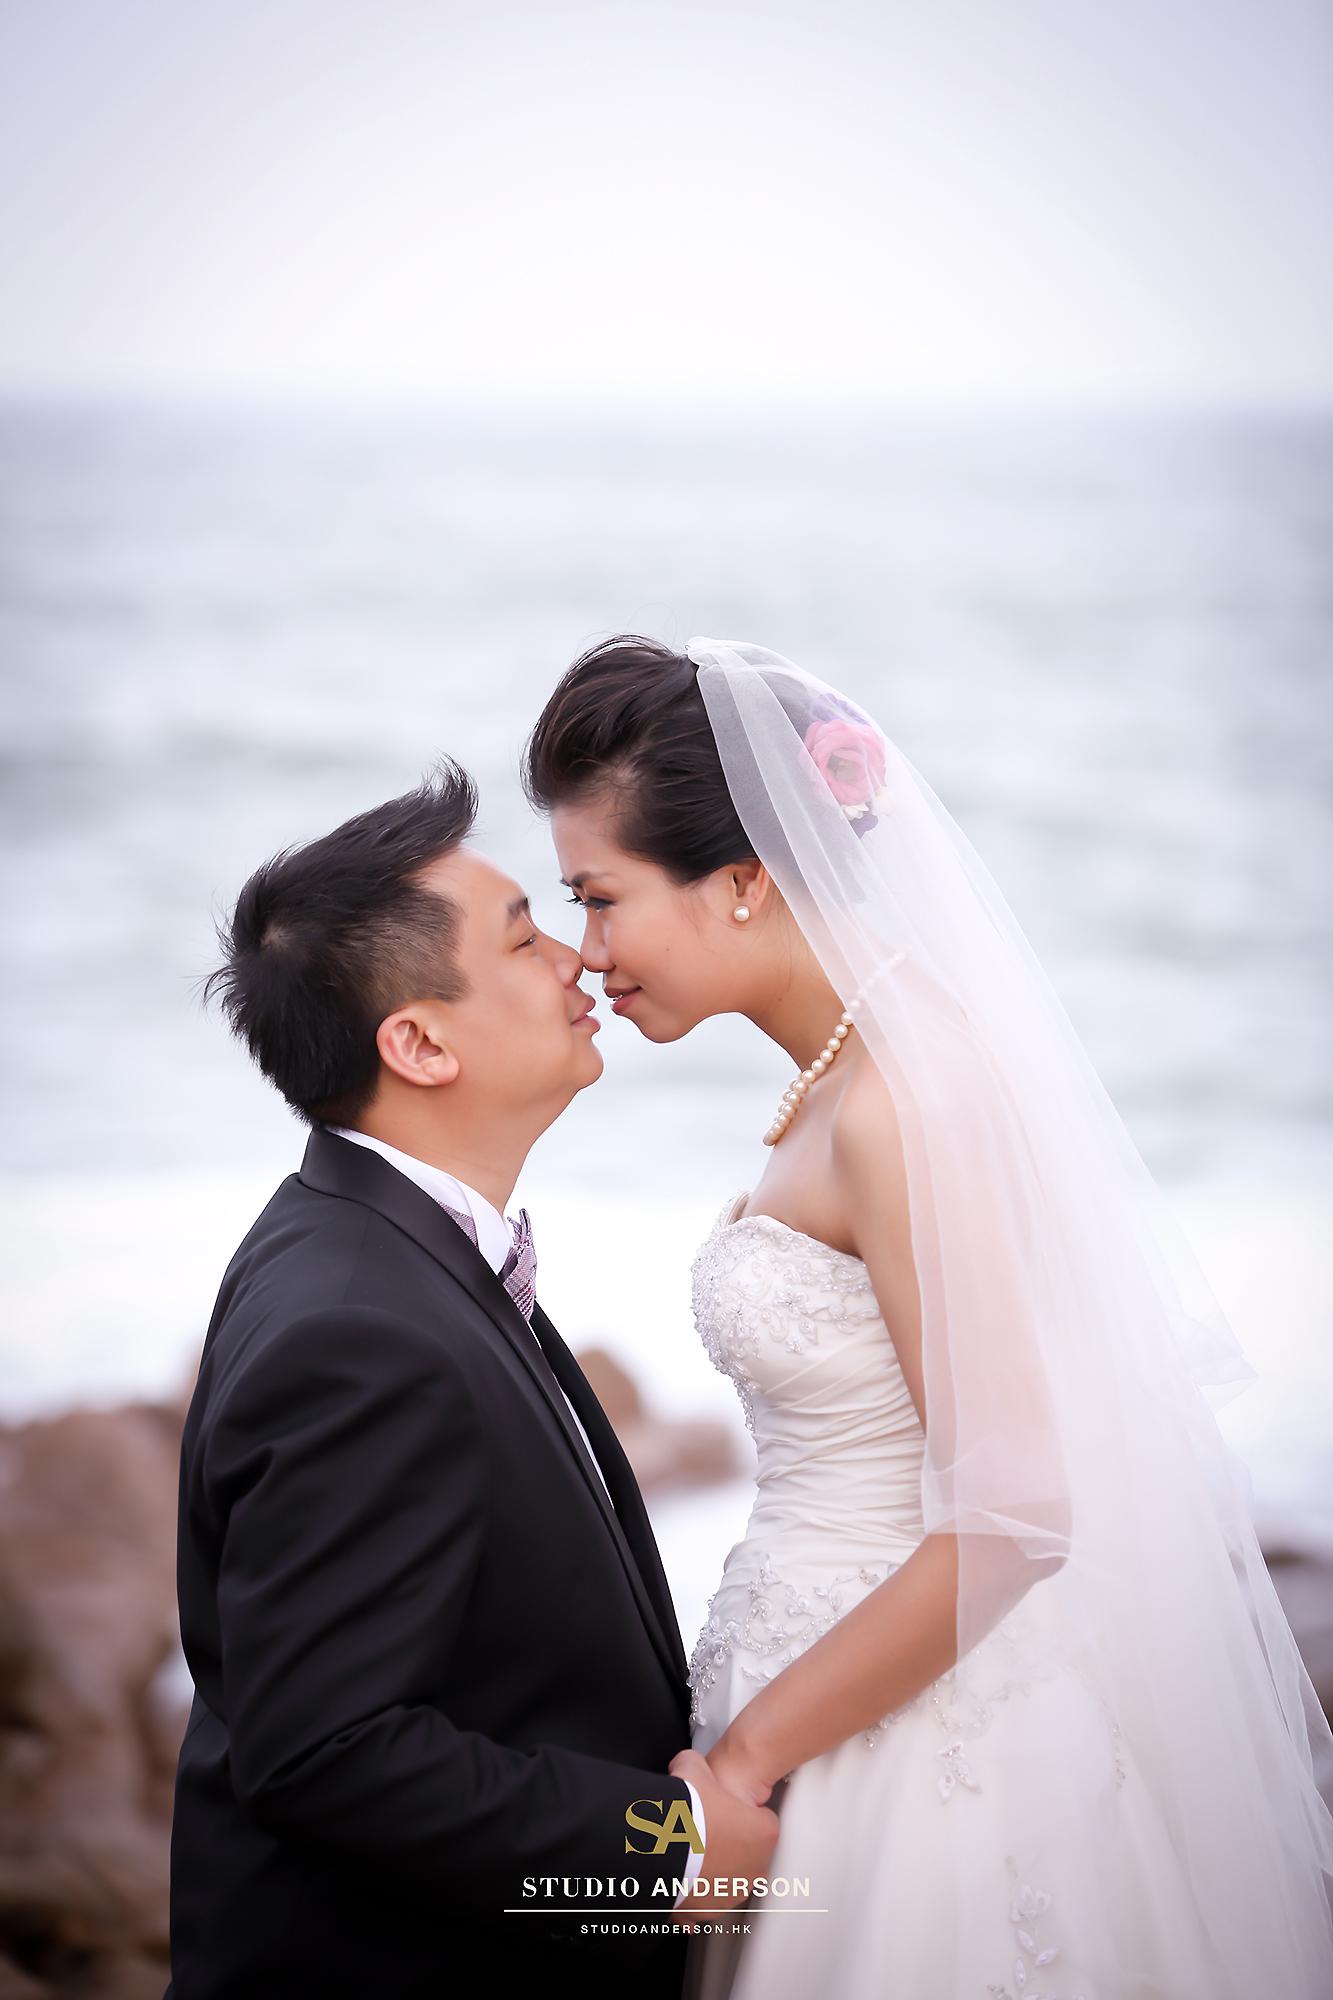 079 - Mandy and Joe Engagement (Watermark).jpg